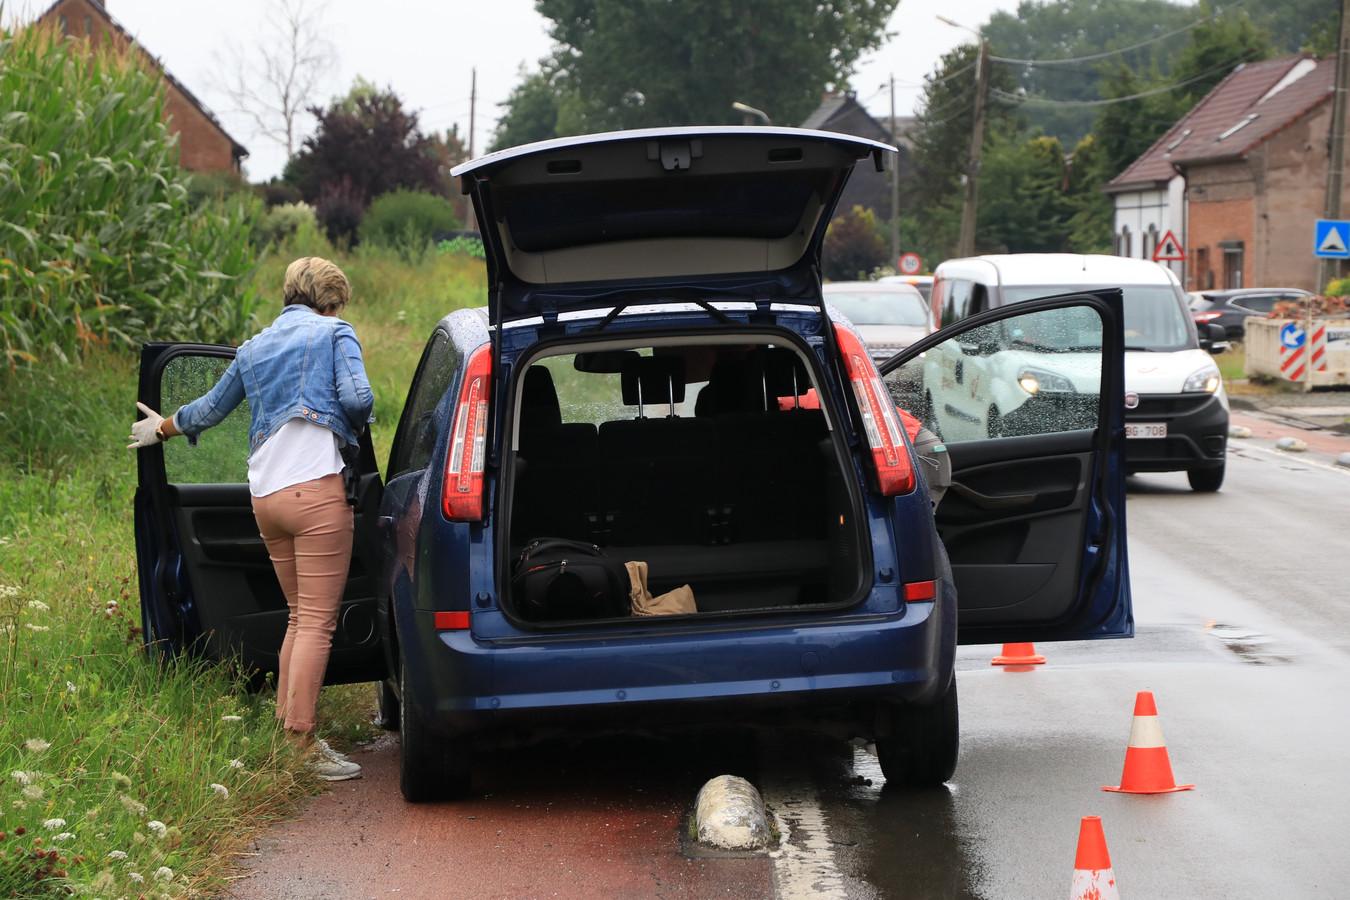 De Ford met Franse nummerplaats crashte in Kruibeke op een varkensrug.